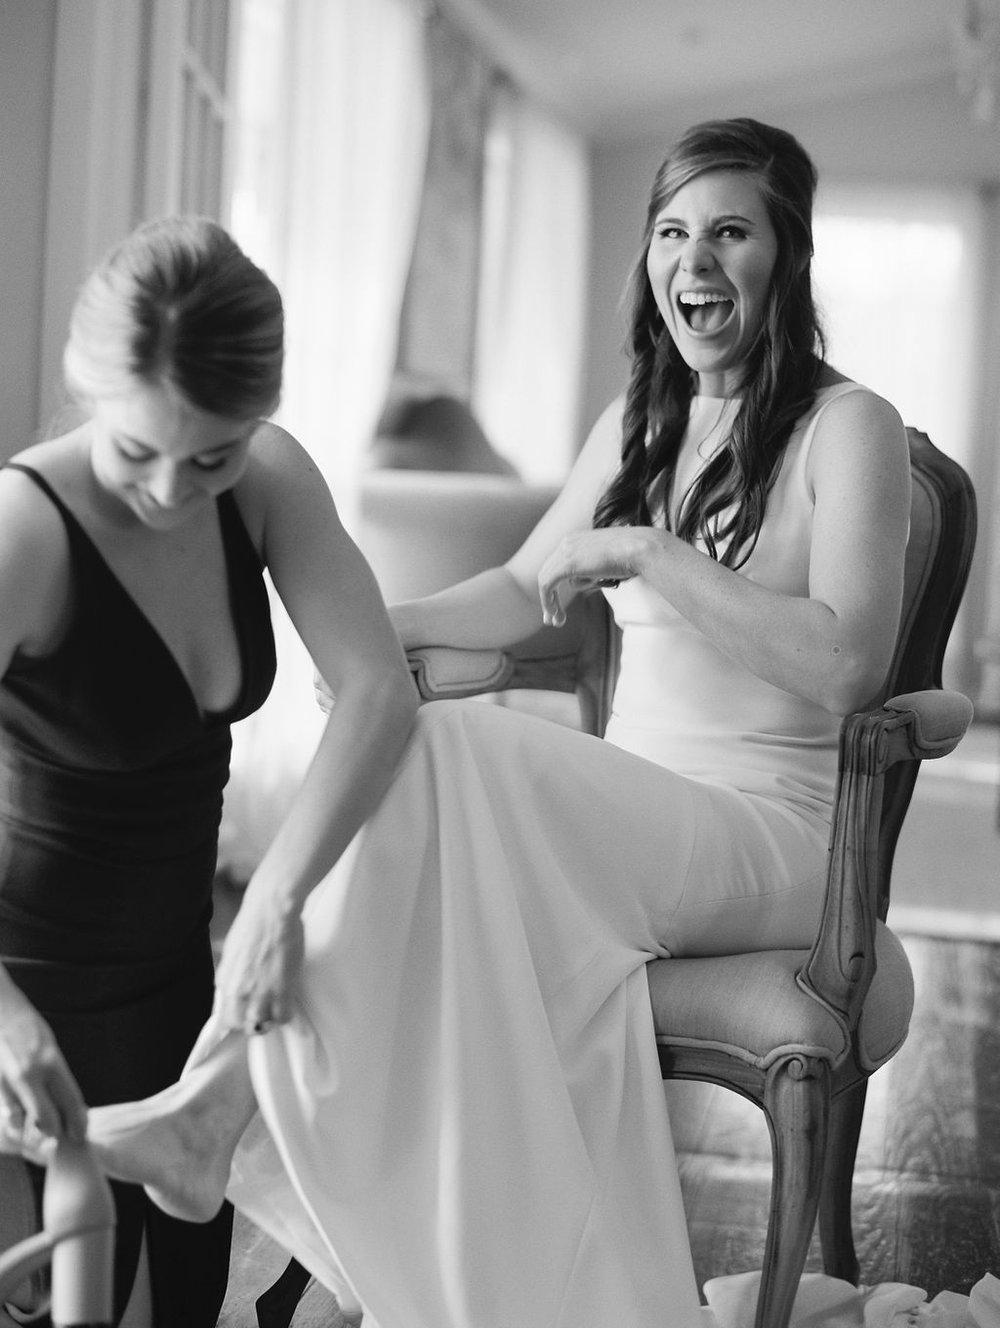 Austin-Texas-Wedding-Photographer-Addison-Grove-Film-10.jpg